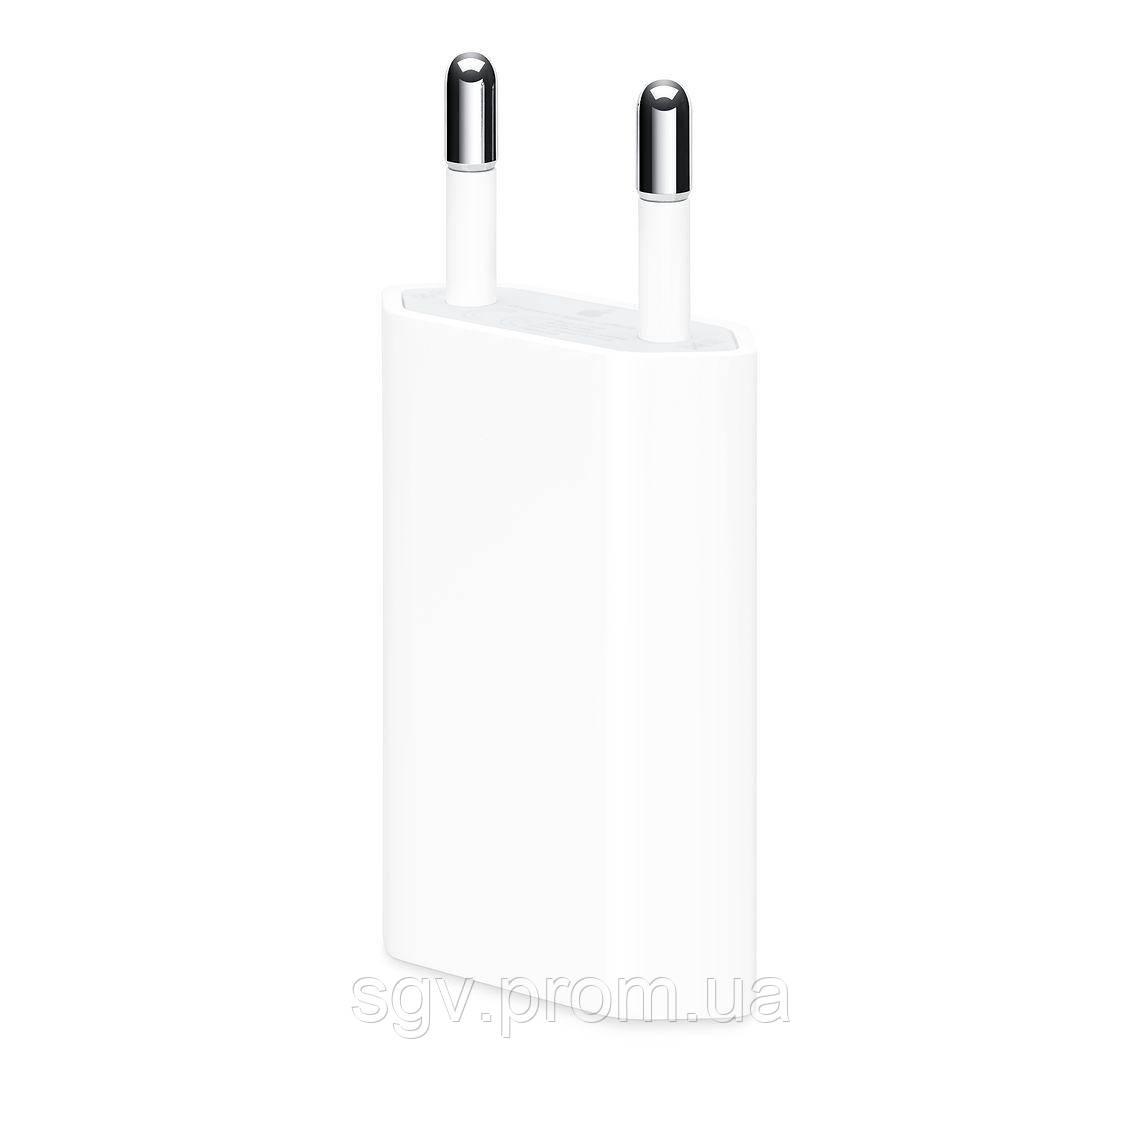 Адаптер питания Apple USB мощностью 5 Вт 1A